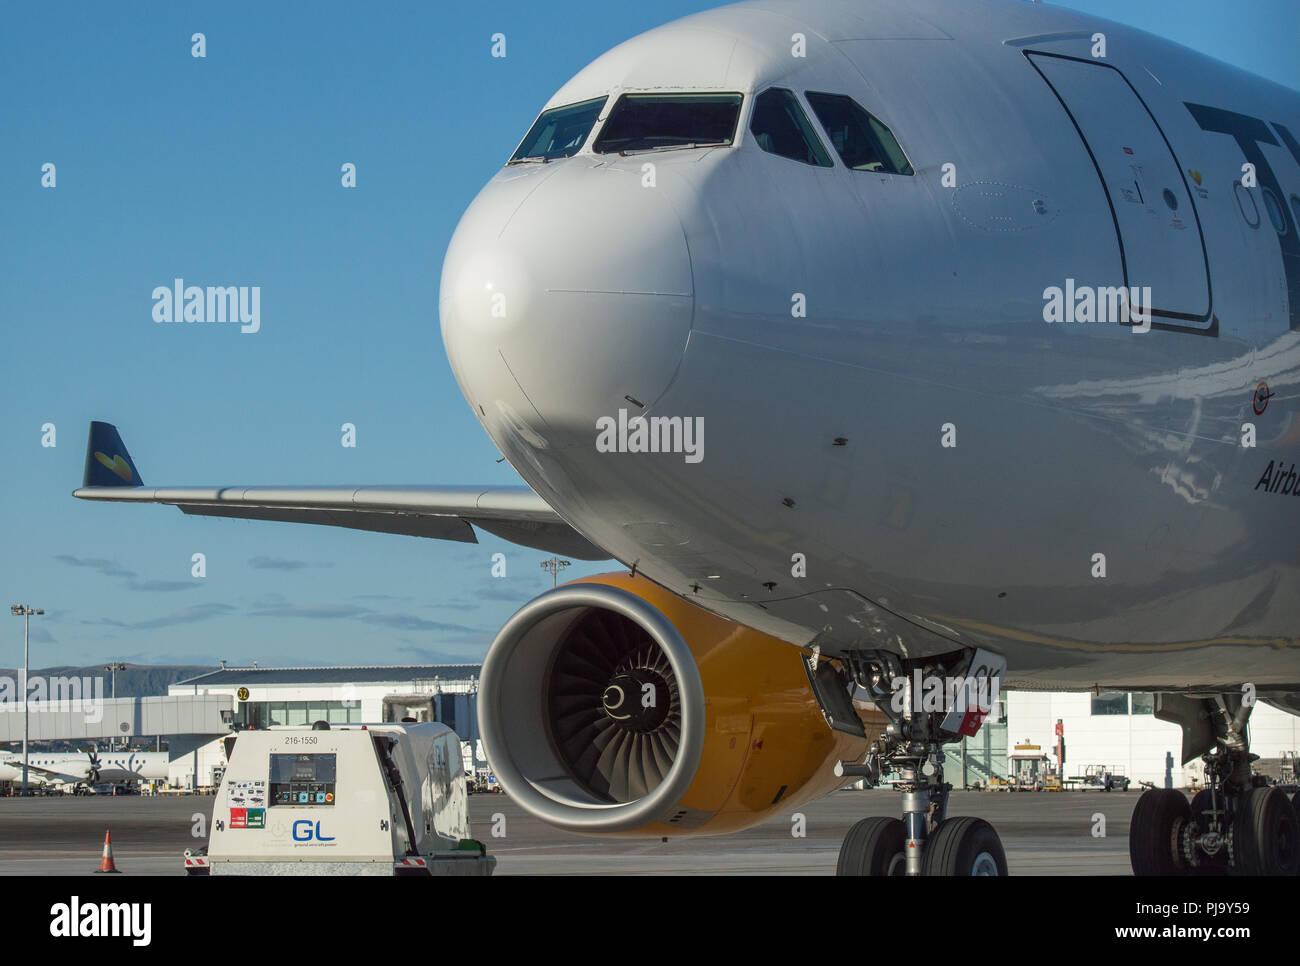 Thomas Cook Airbus A330 aircraft seen at Glasgow International Airport, Renfrewshire, Scotland - 10th September 2017 Stock Photo